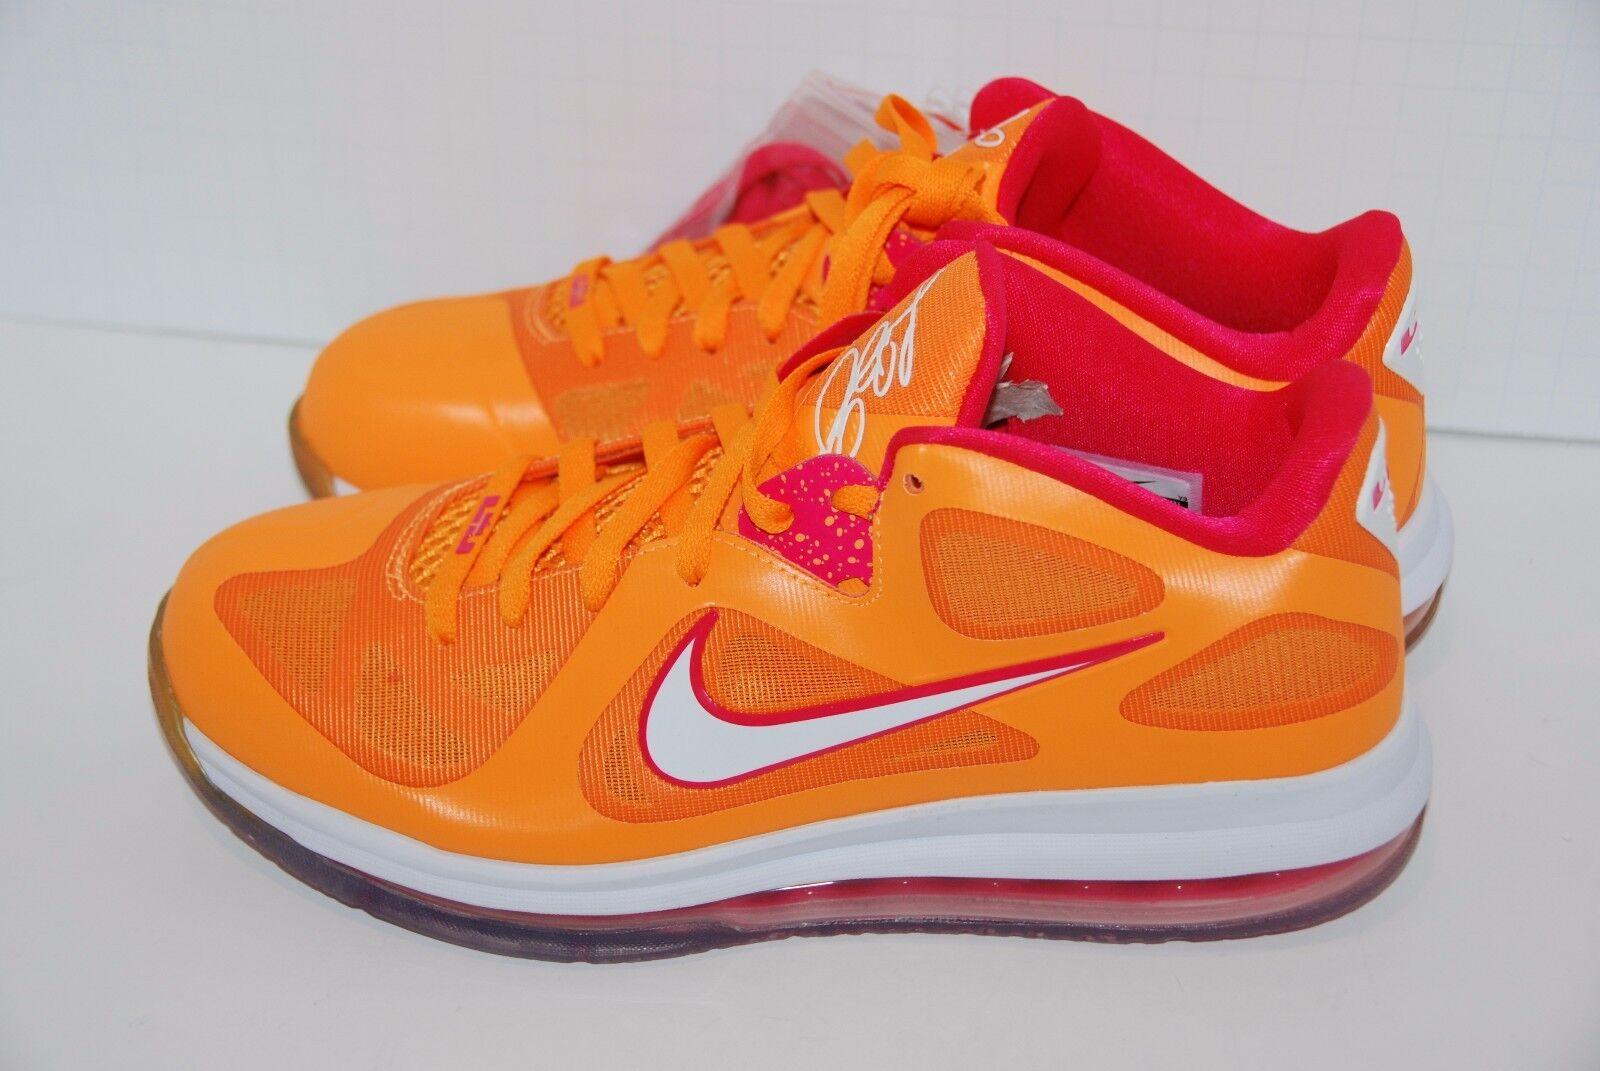 Nike Air Max LEBRON IX 9 Low FLORIDIAN ORANGE CHERRY PINK WHITE 510811-800 9 US